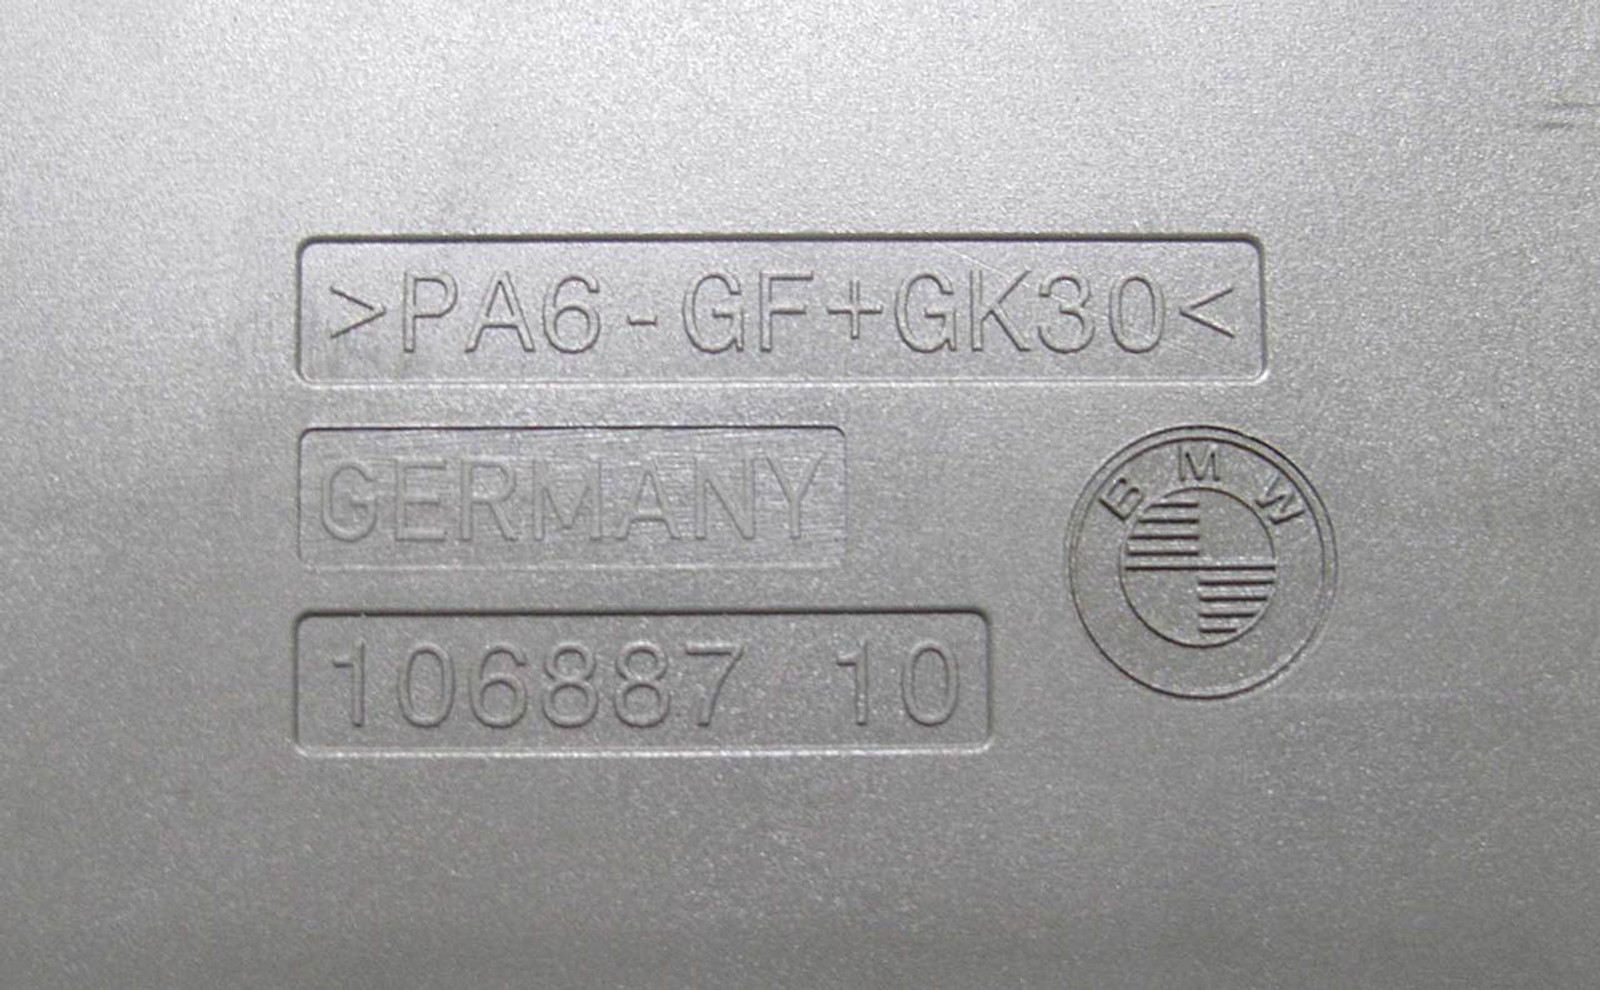 1998 Bmw 328i Front Fuse Box Diagram